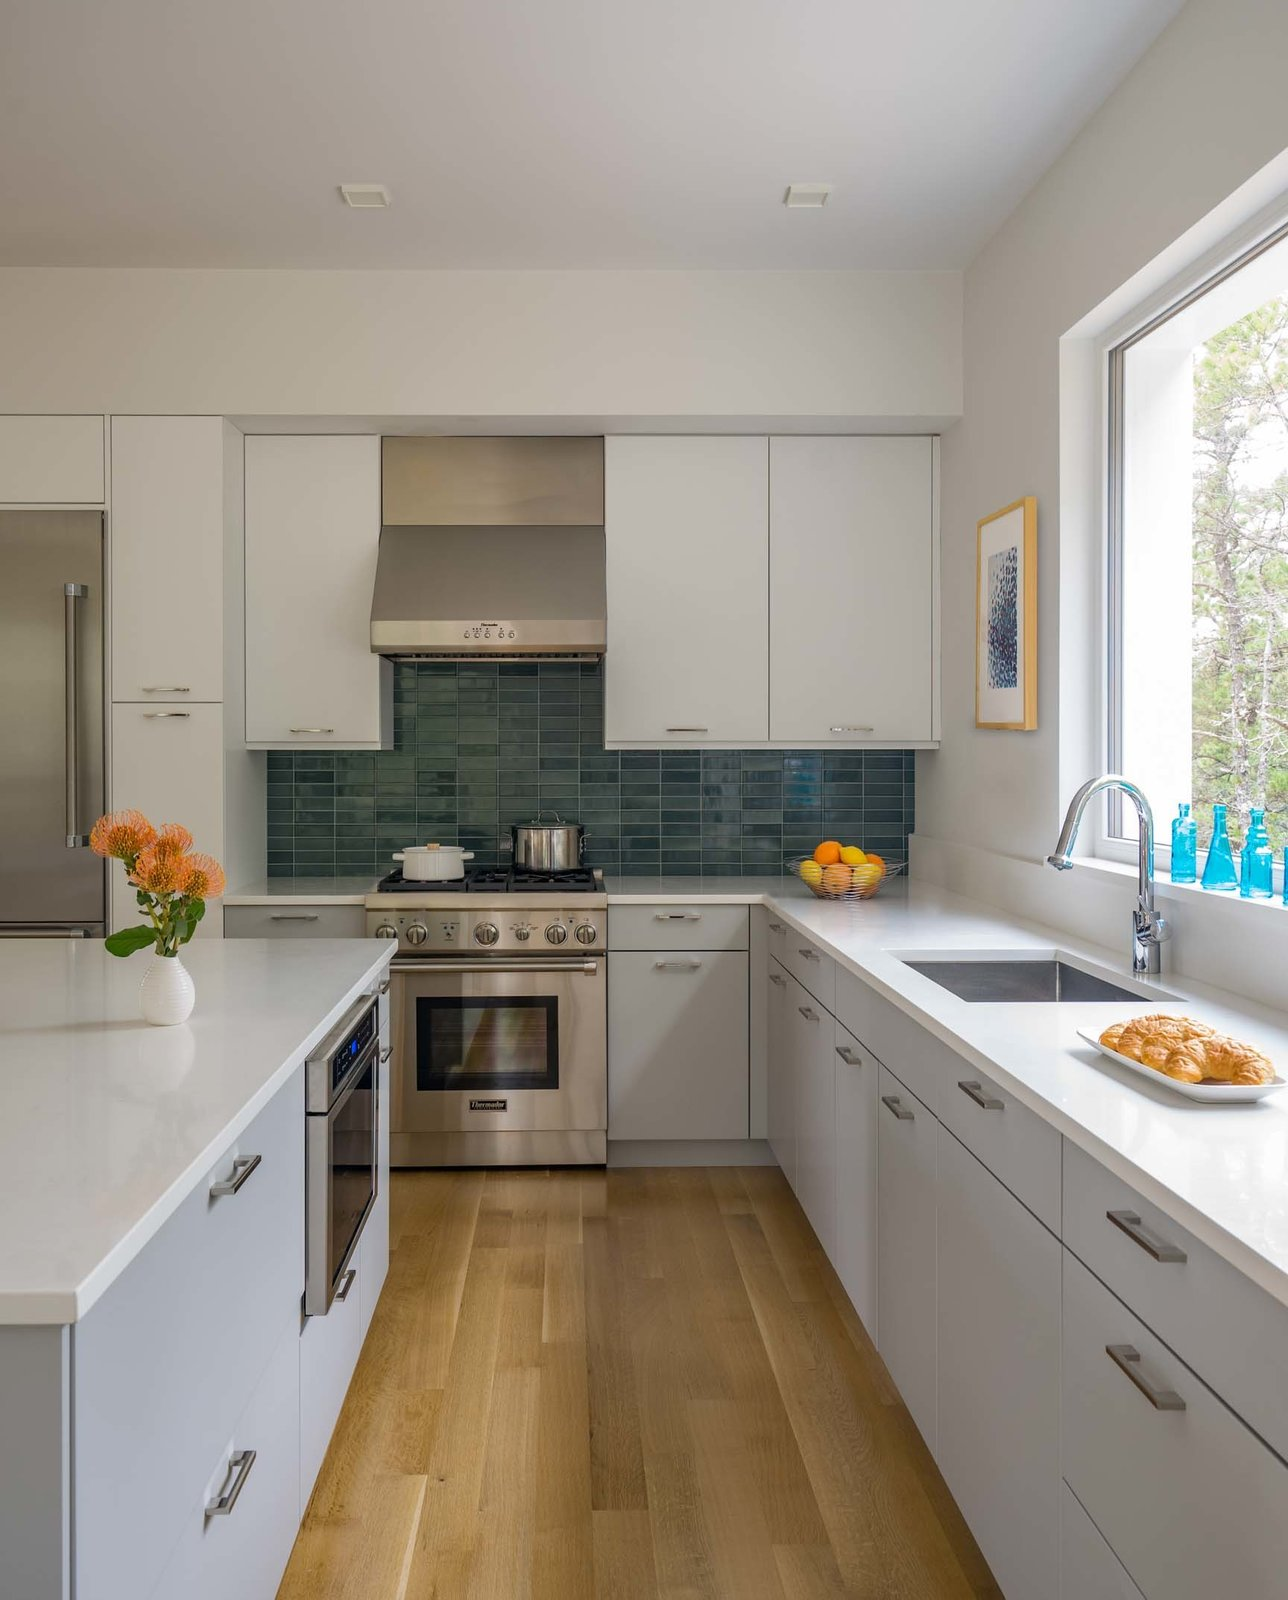 Kitchen, Range, Range Hood, Ceiling, Glass Tile, Undermount, and Wall Oven  Best Kitchen Ceiling Glass Tile Photos from Wellfleet Modern